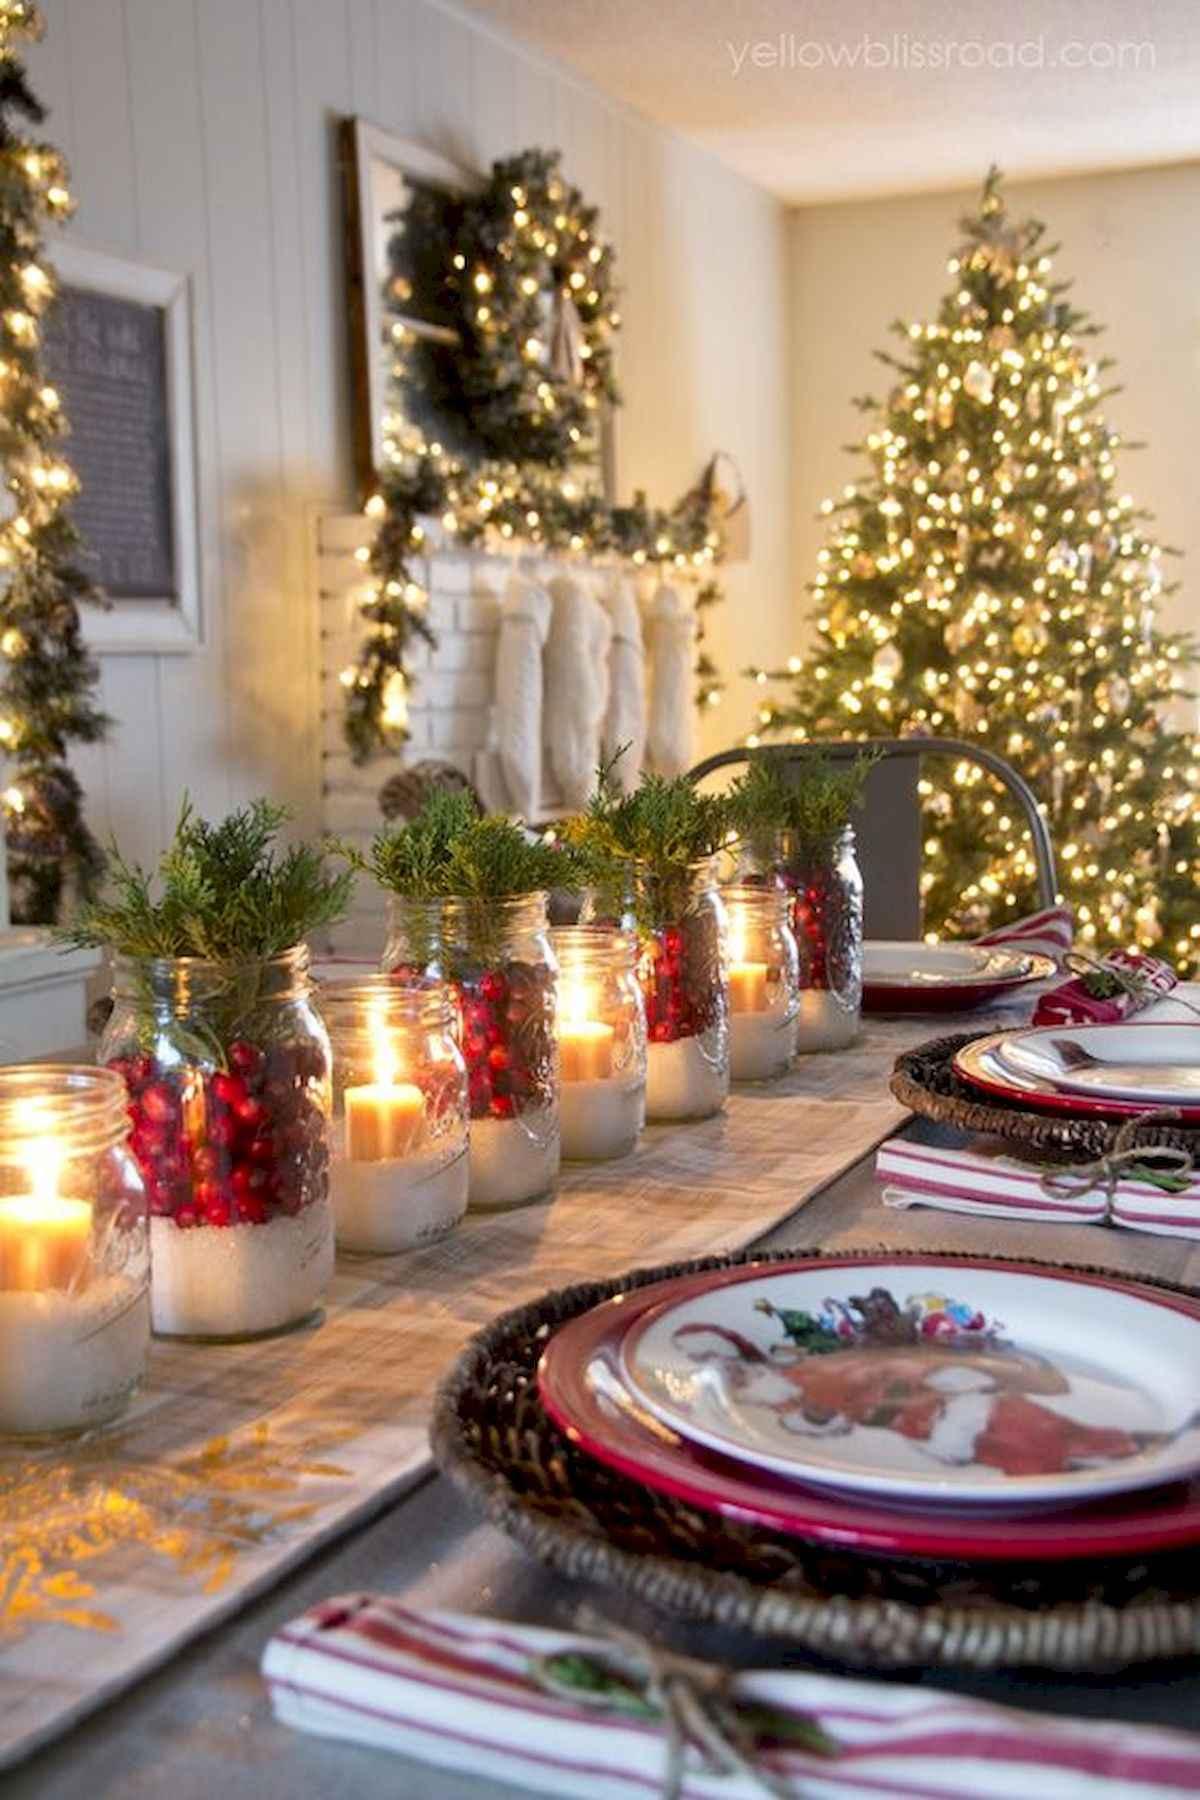 1200 1800 in 35 beautiful christmas decor ideas table centerpiece